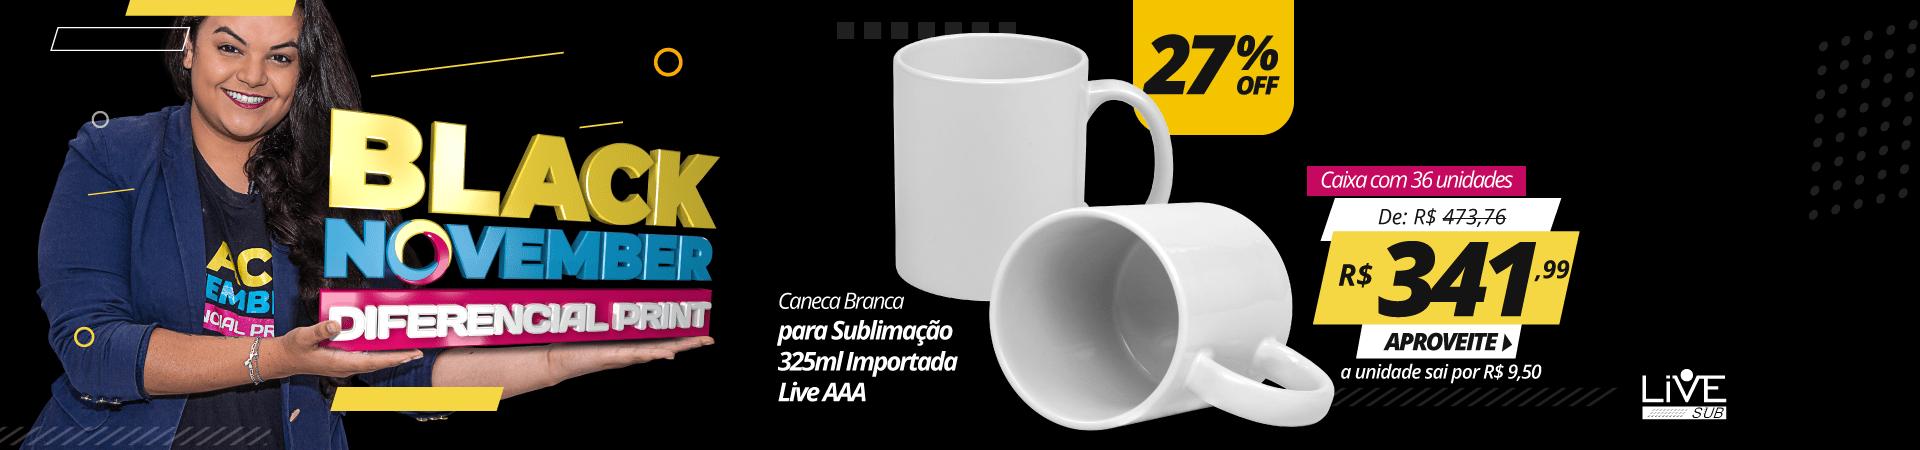 Black November 2020 - Caneca Branca 36 und